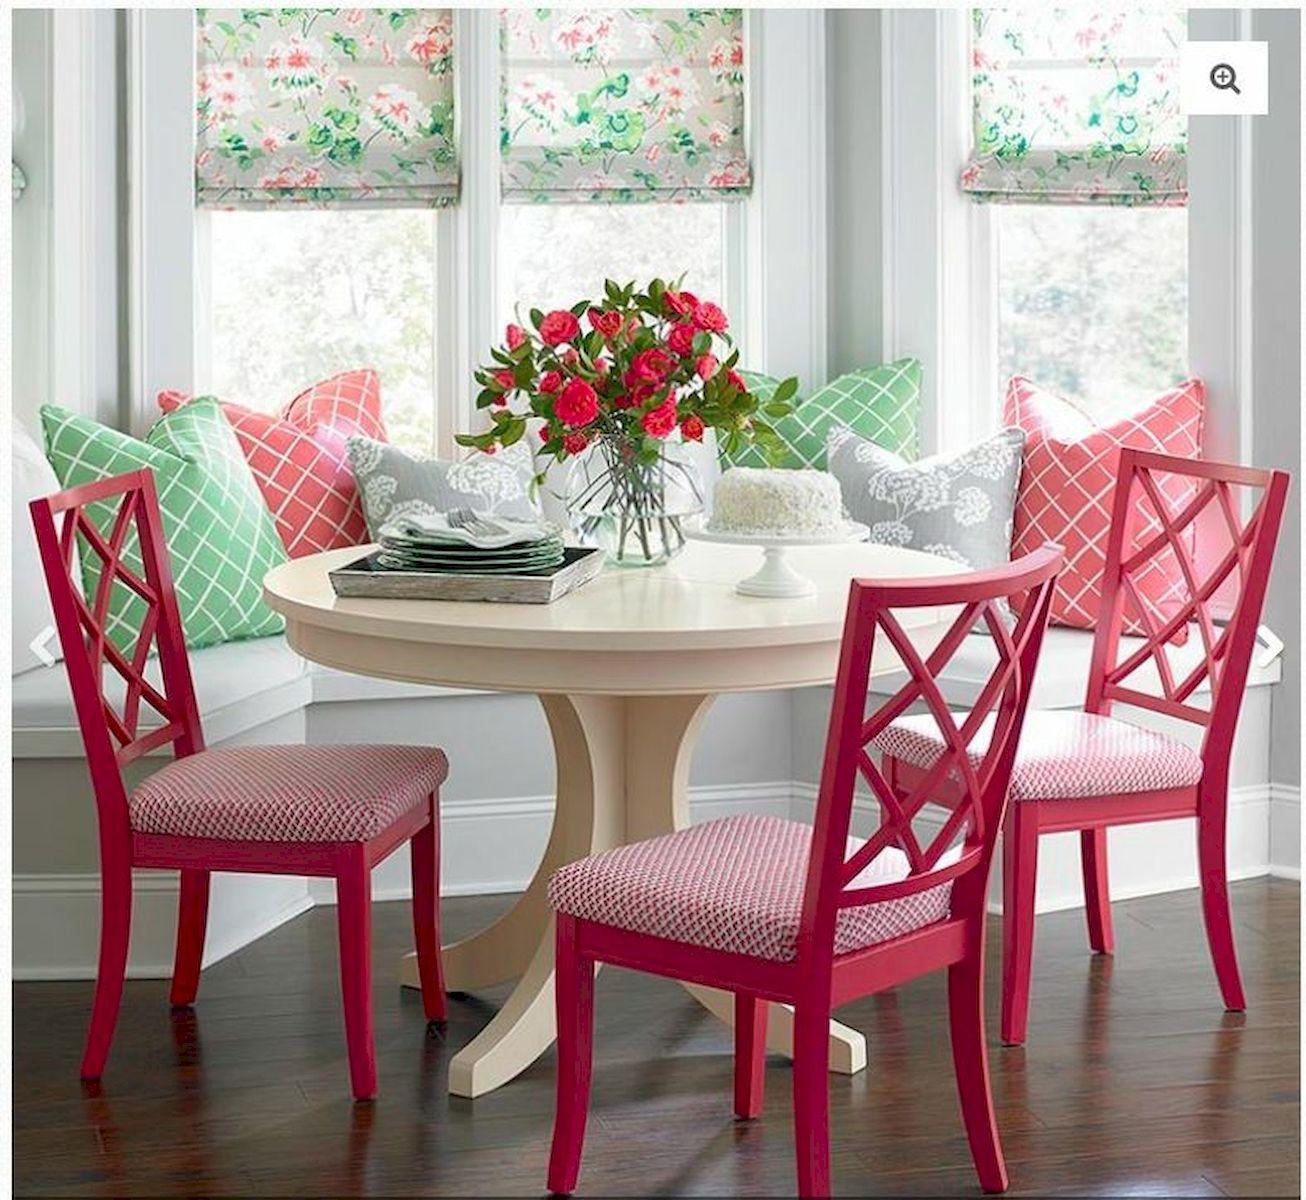 45 Colorful Interior Home Design And Decor Ideas (3)